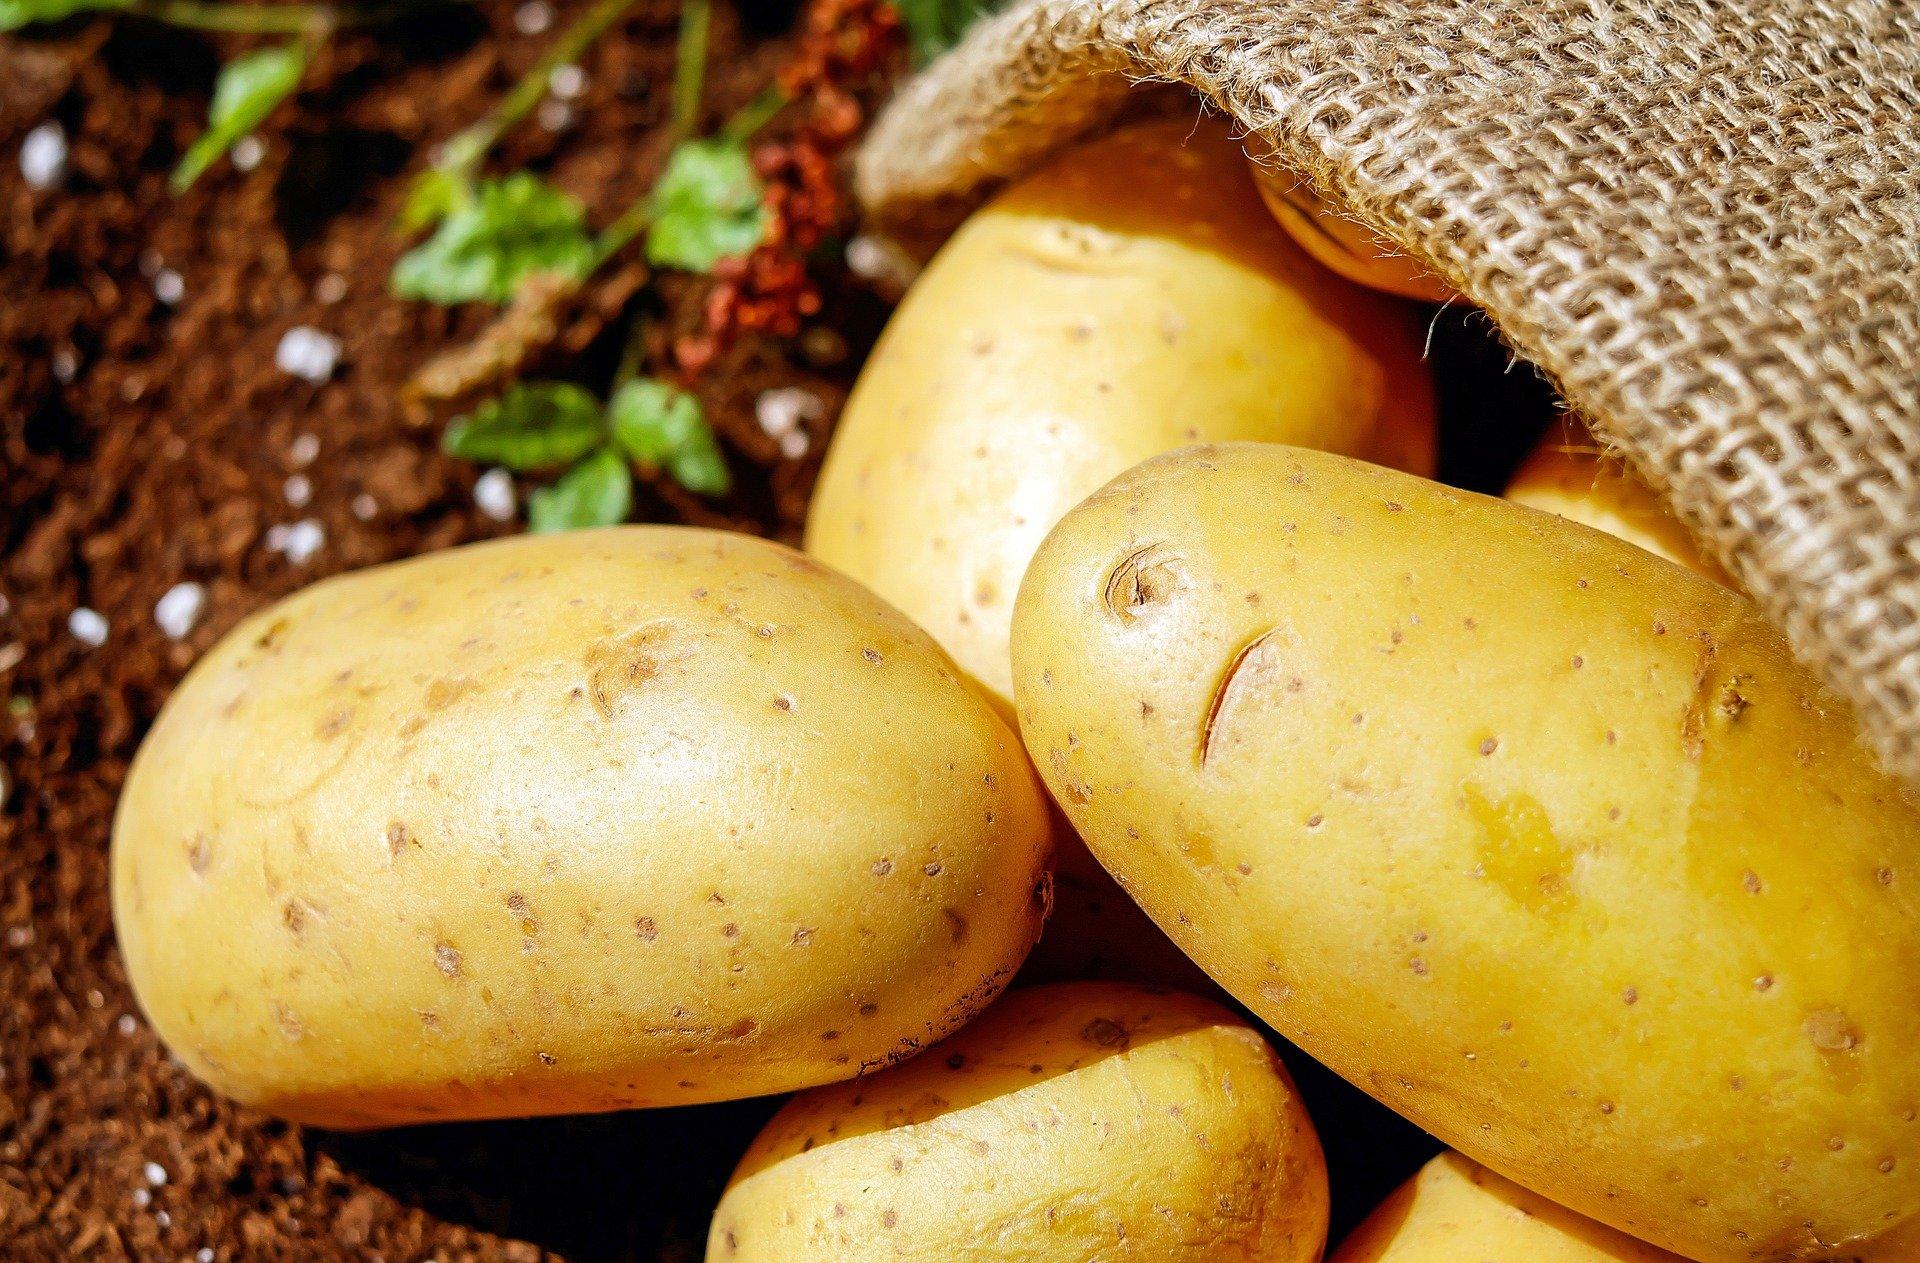 potatoes-1585060_1920